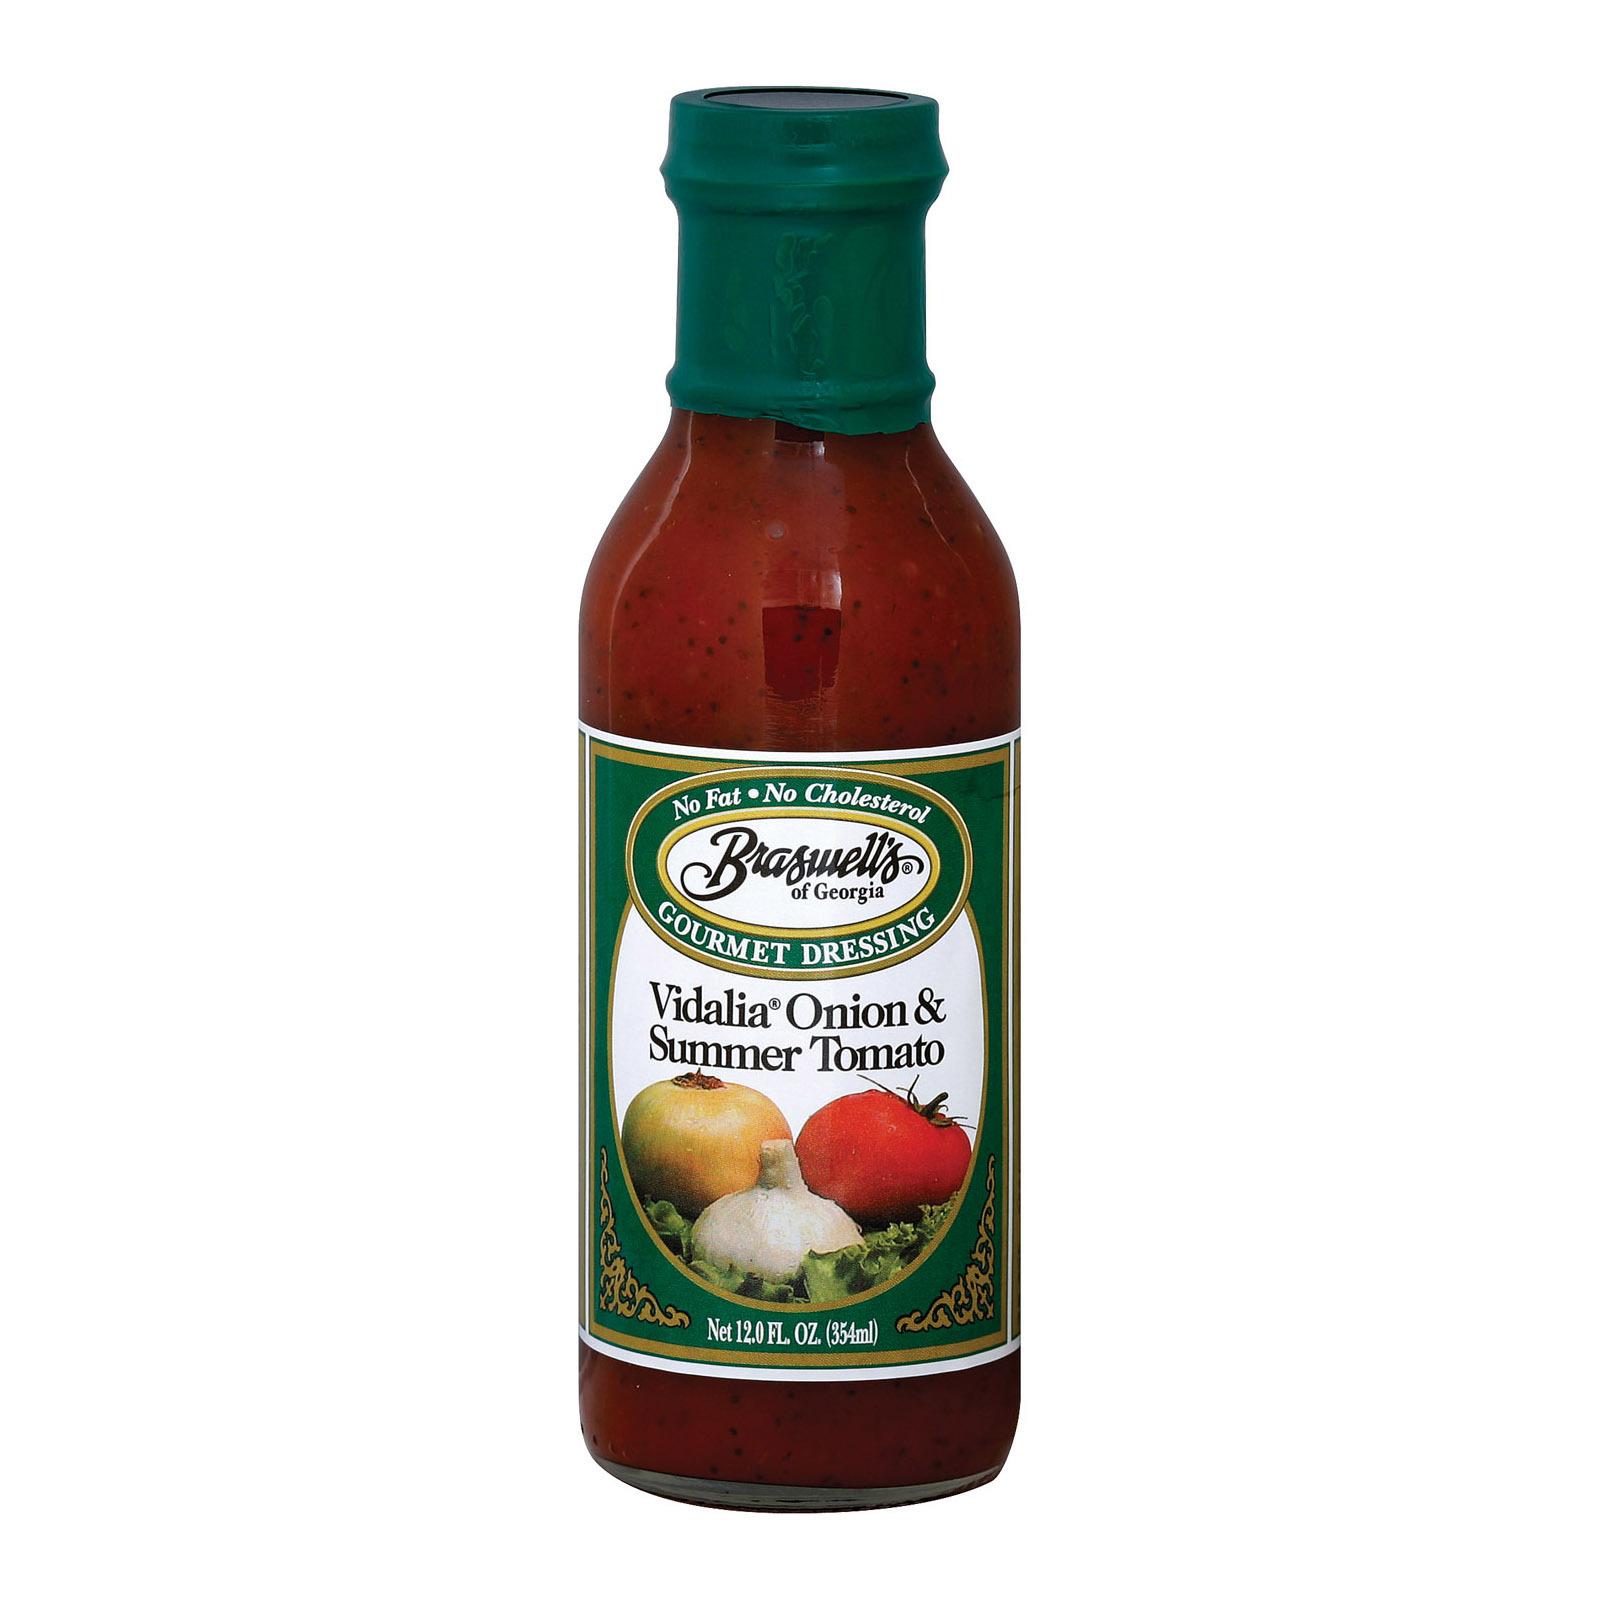 Braswell's Gourmet Dressing - Vidalia Onion and Summer Tomato - Case of 6 - 12 Fl oz.